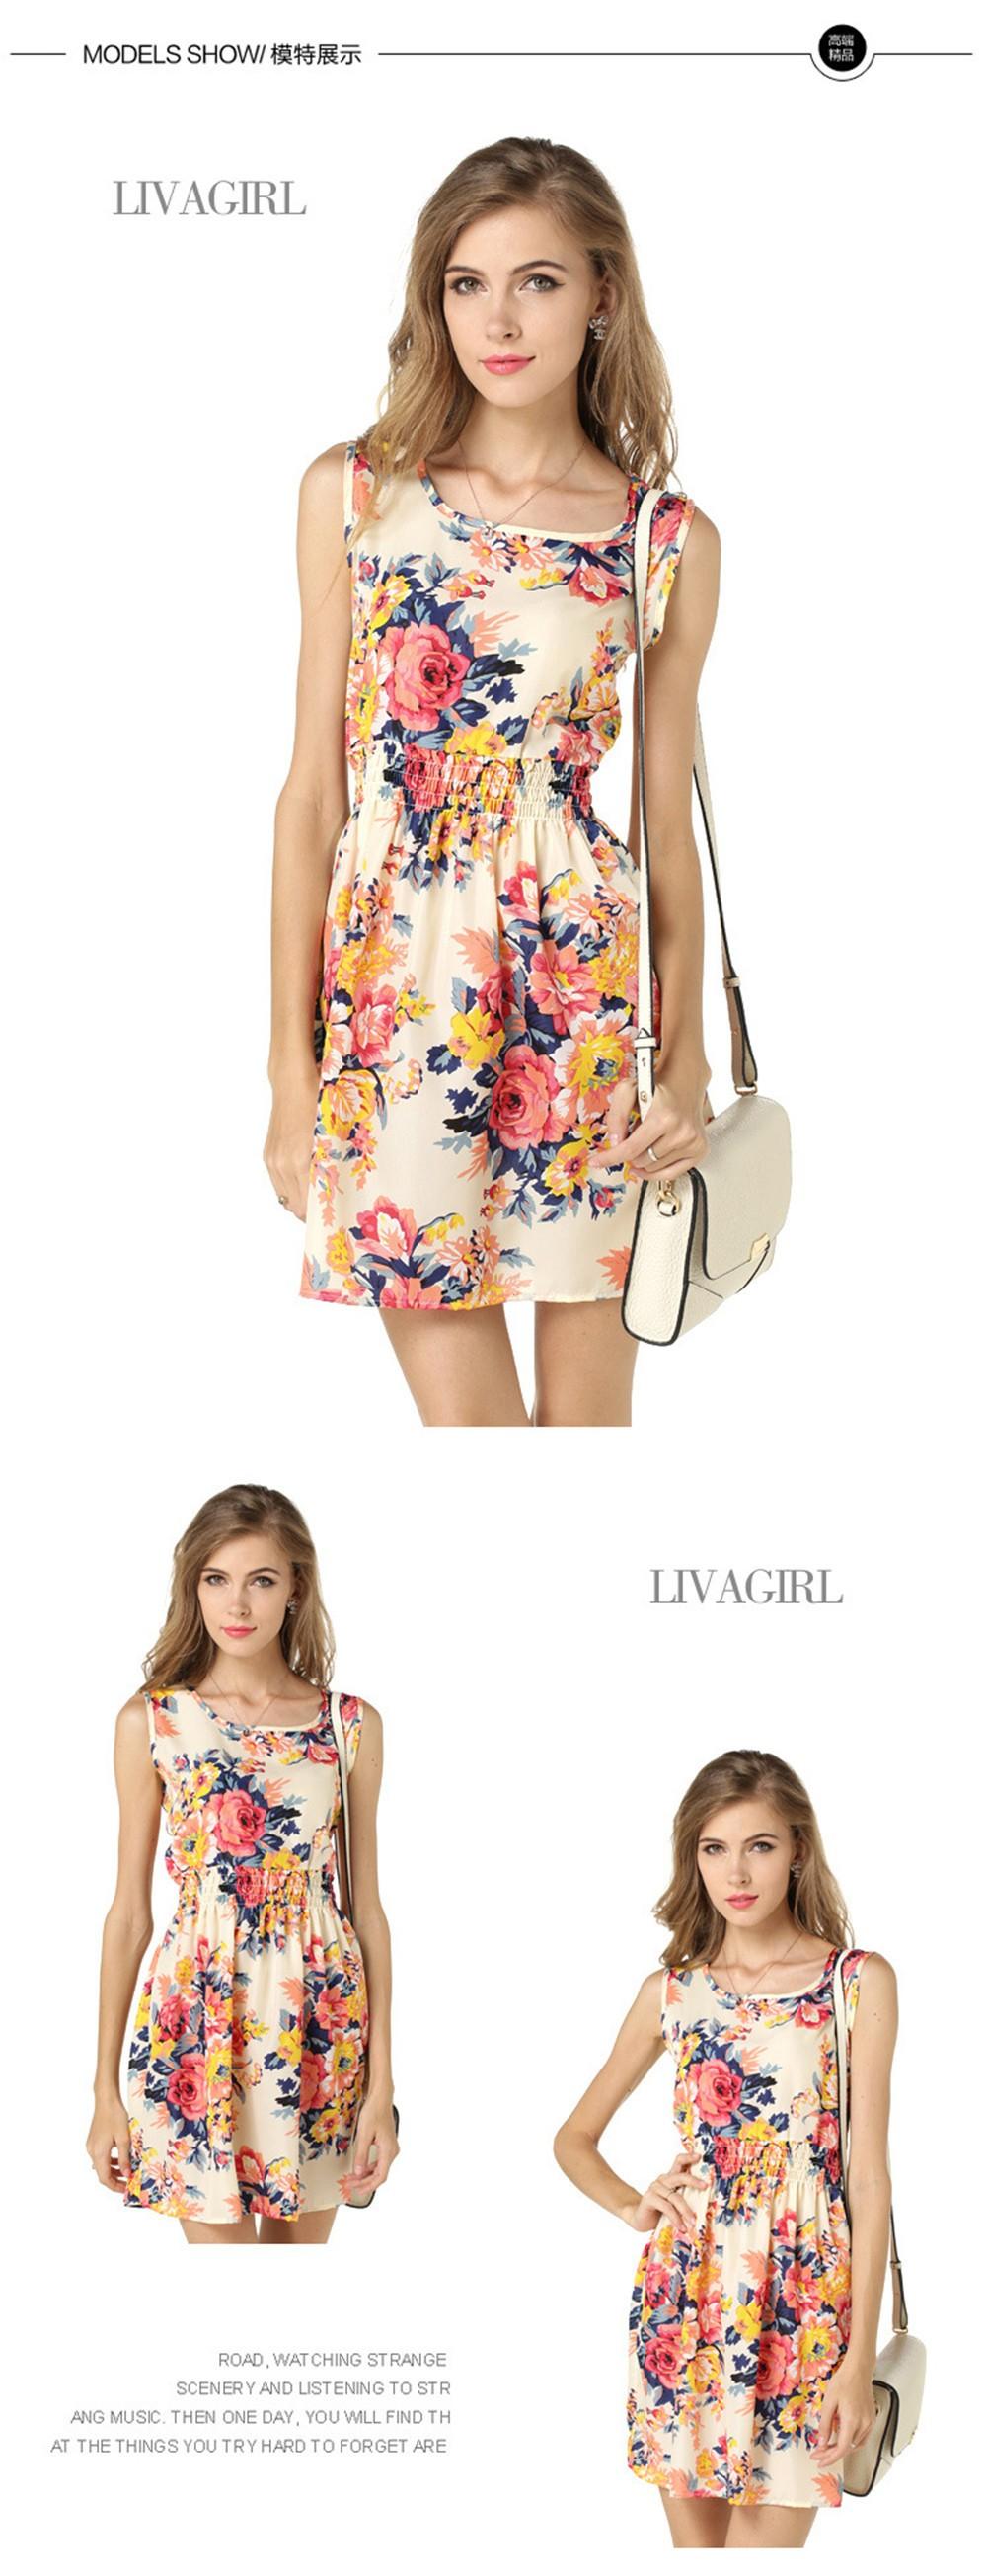 Fashion Tunic Women Dress 2016 Plus Size XXL O-neck WOMEN DRESS Summer Style Floral Print Casual Dresses Women Vestidos Woman (60)